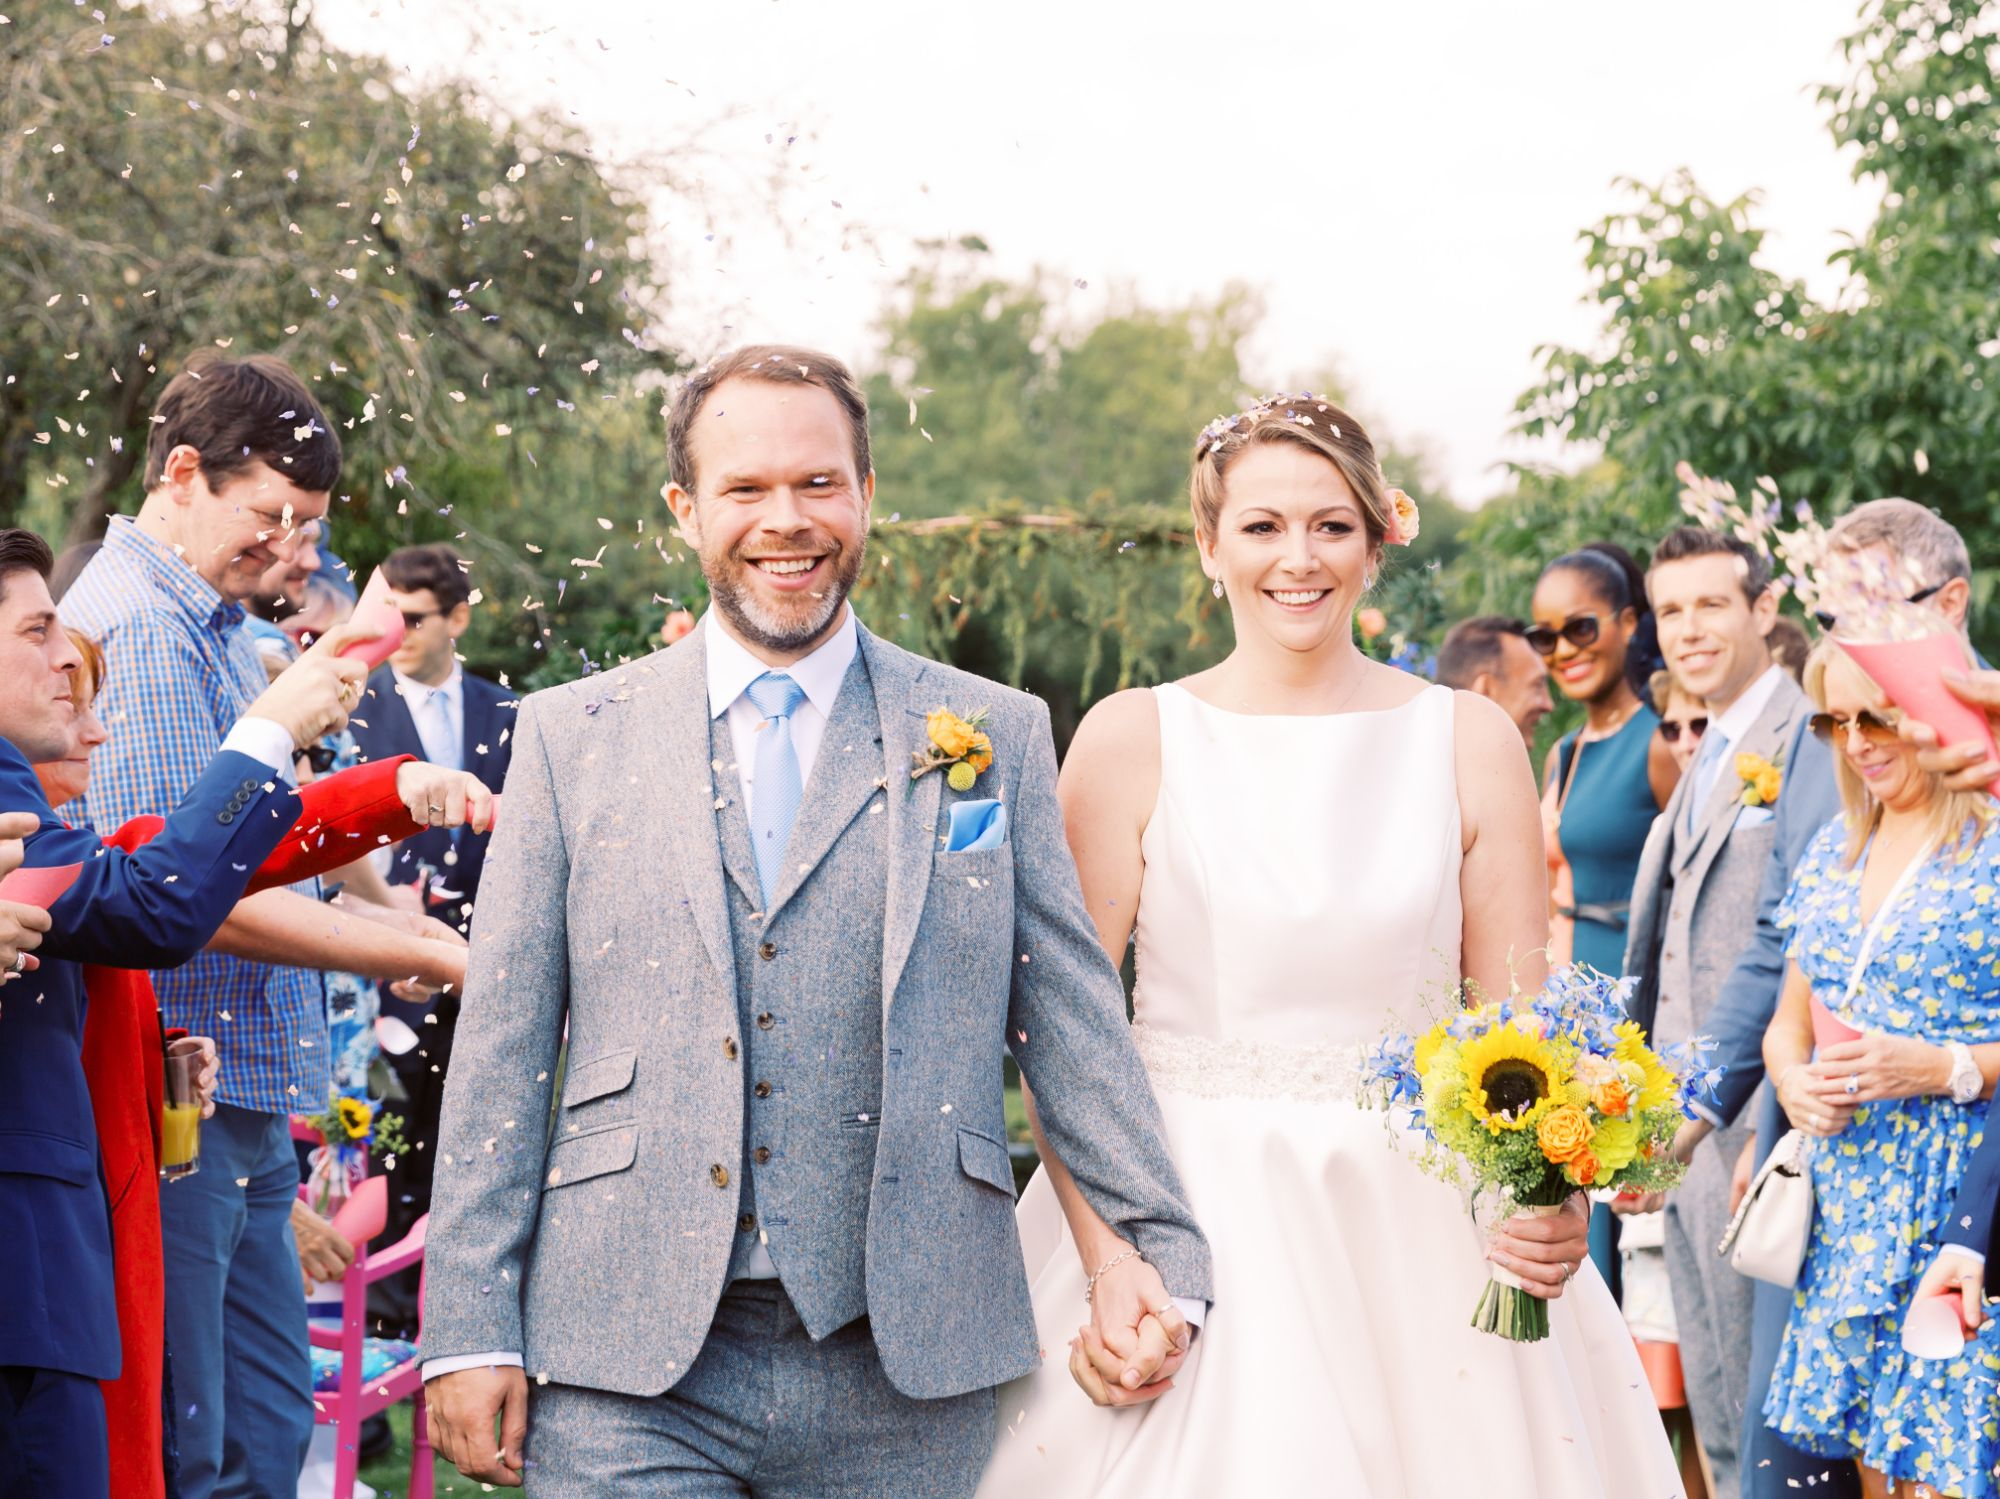 Terry-Li-Photography-David-Jennifer-Wedding-Day-165.jpg